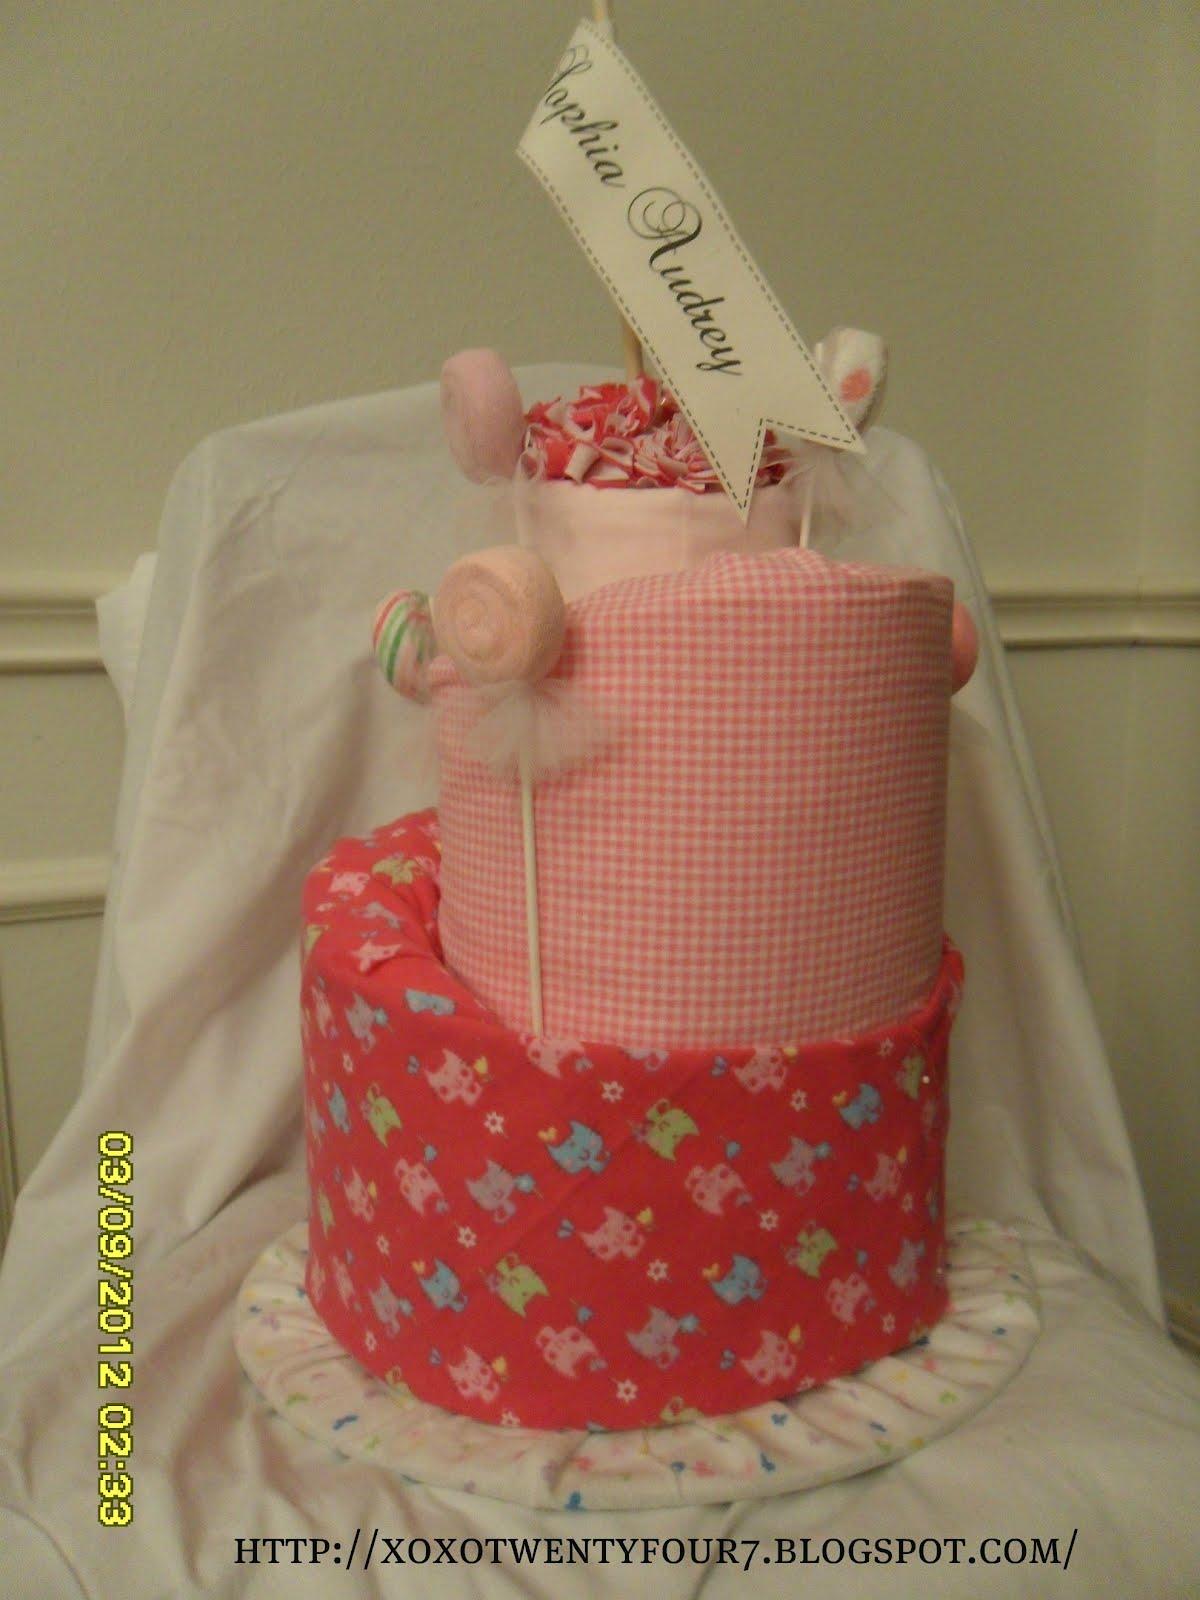 xoxo twentyfour7 topsy turvy diaper cake